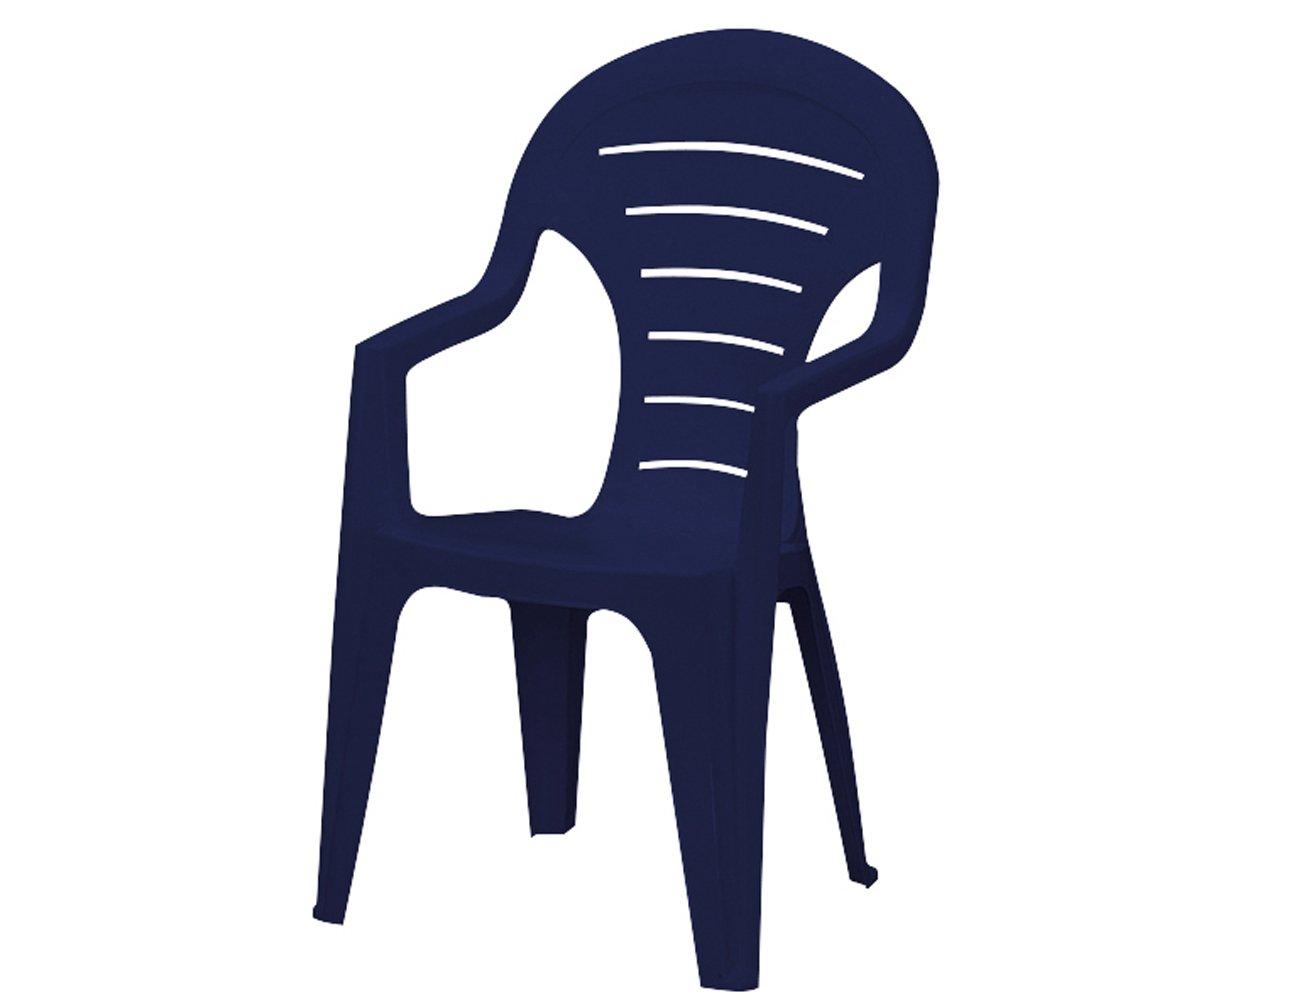 Jardin 142671 Stapelsessel Bonaire, Vollkunststoff, 55.5 x 57 x 92 cm, blau günstig kaufen